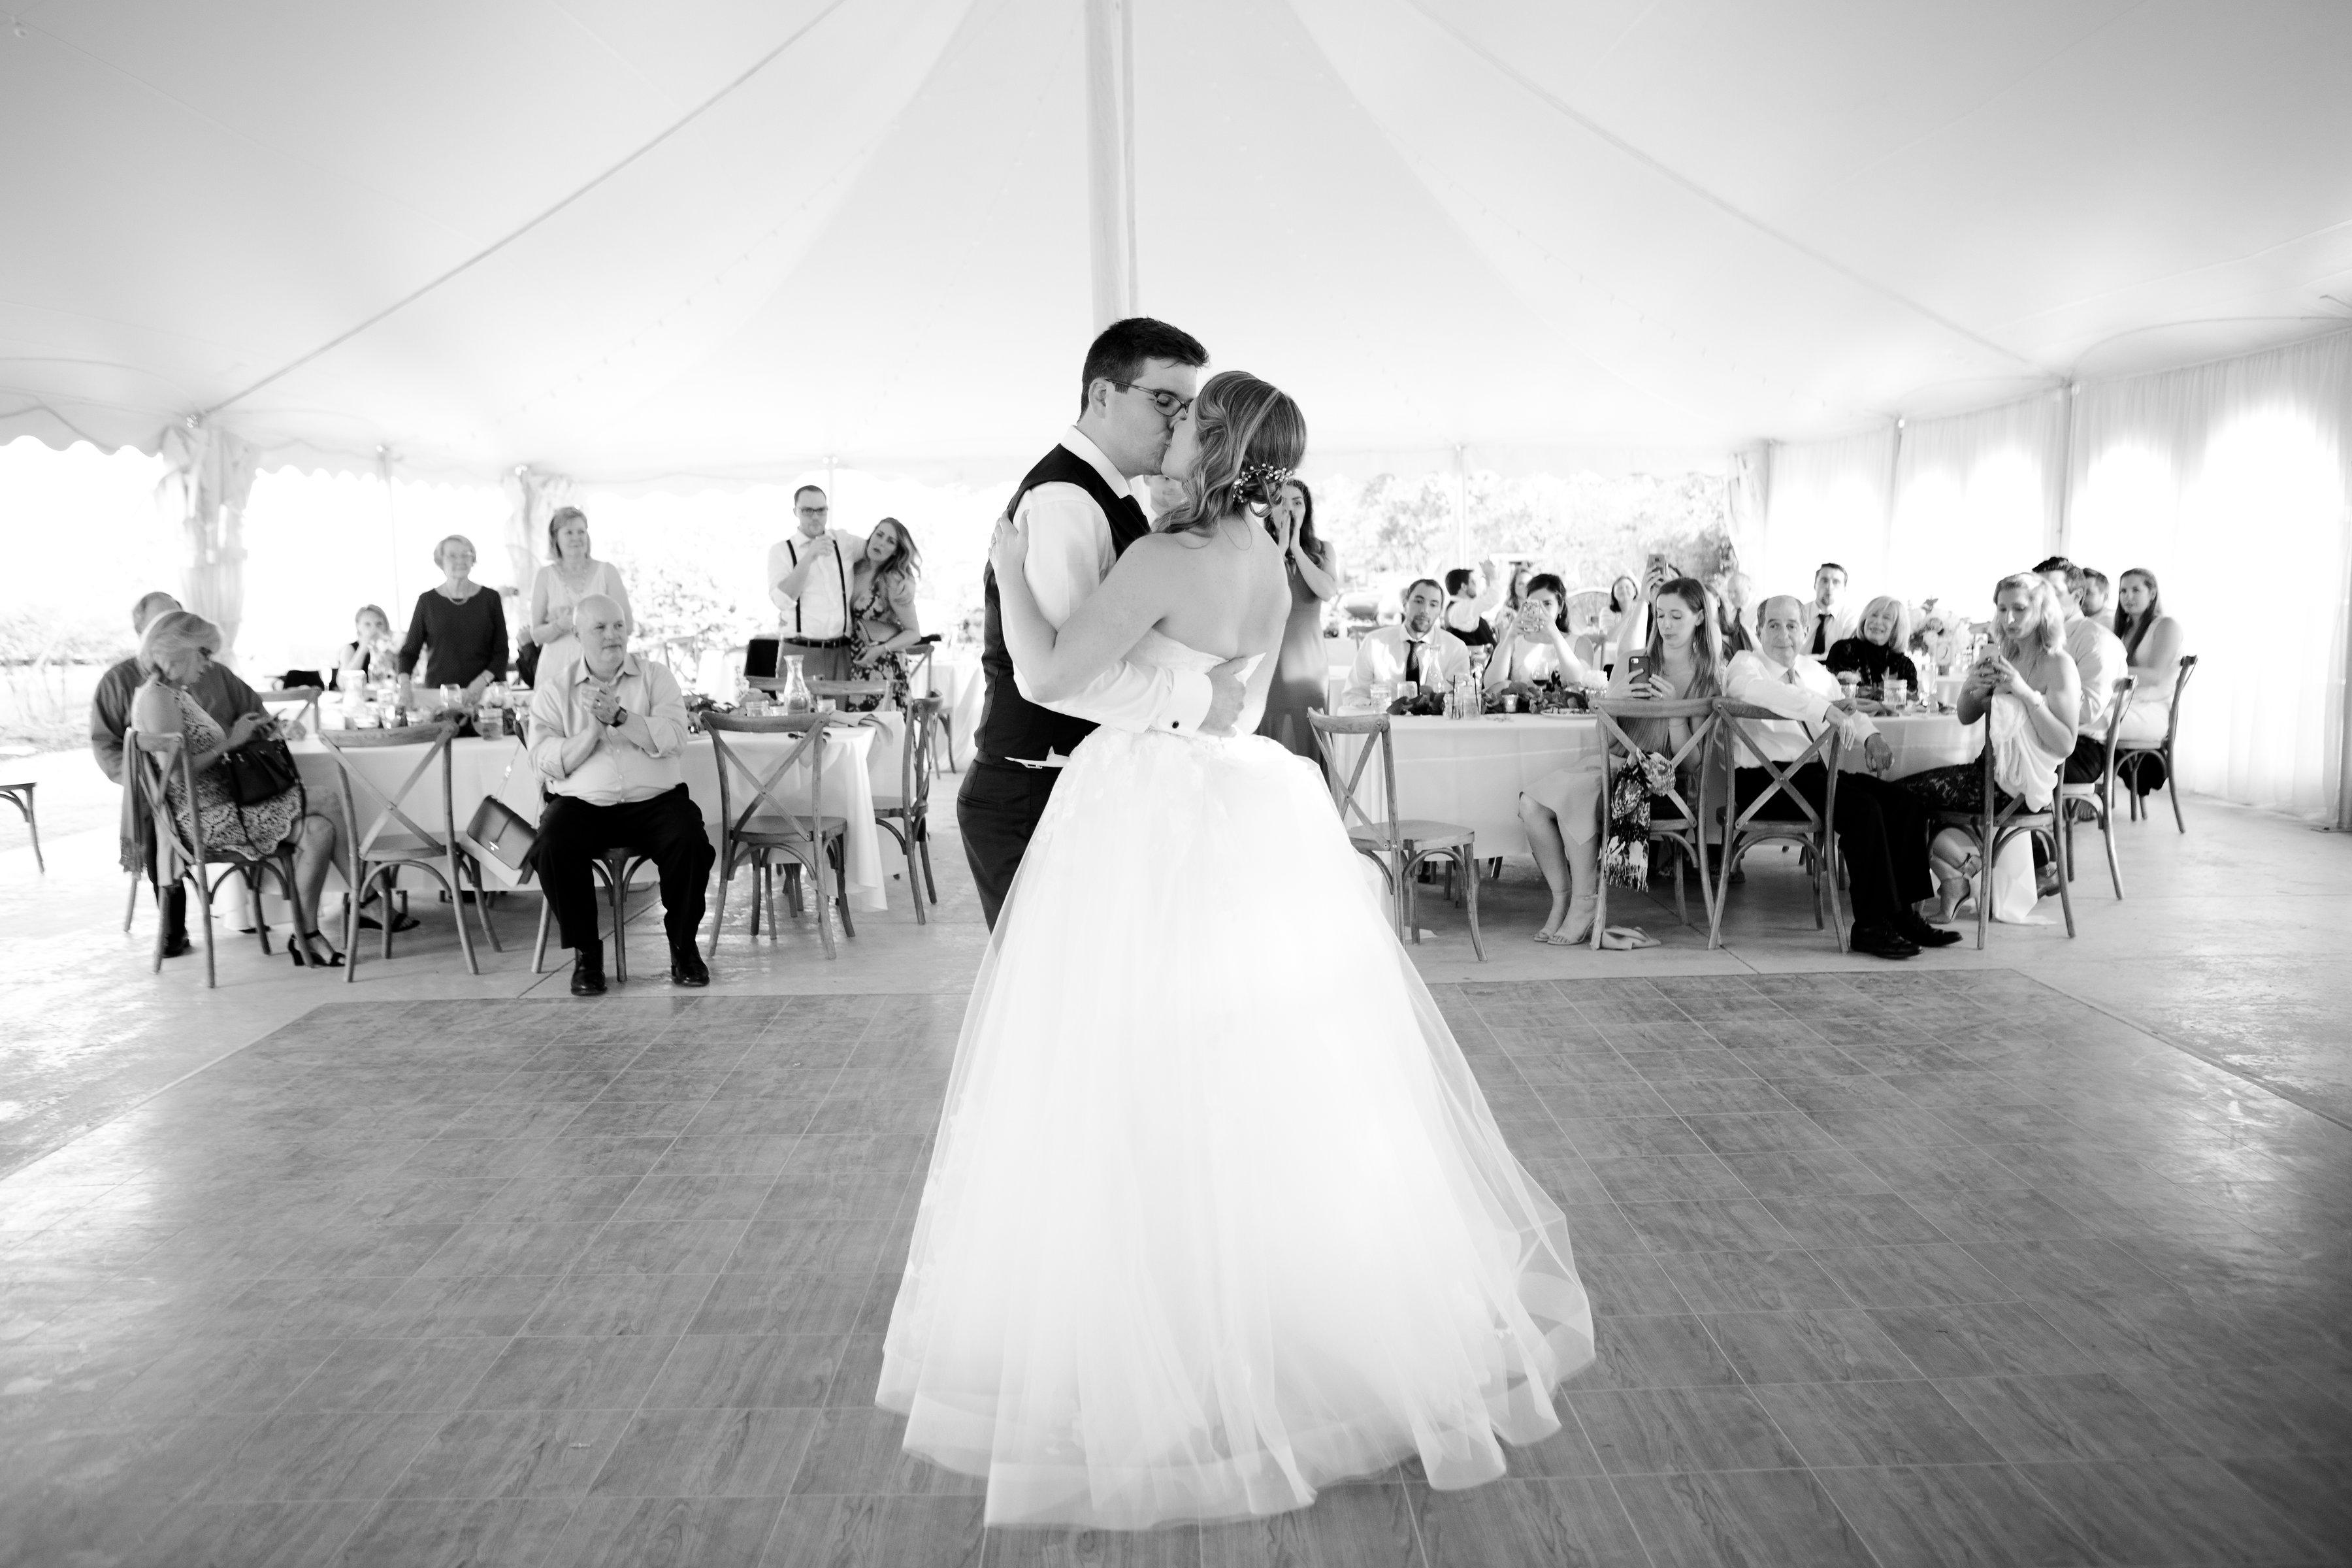 alexandra-lee-photography-chicago-wedding-photographer-184